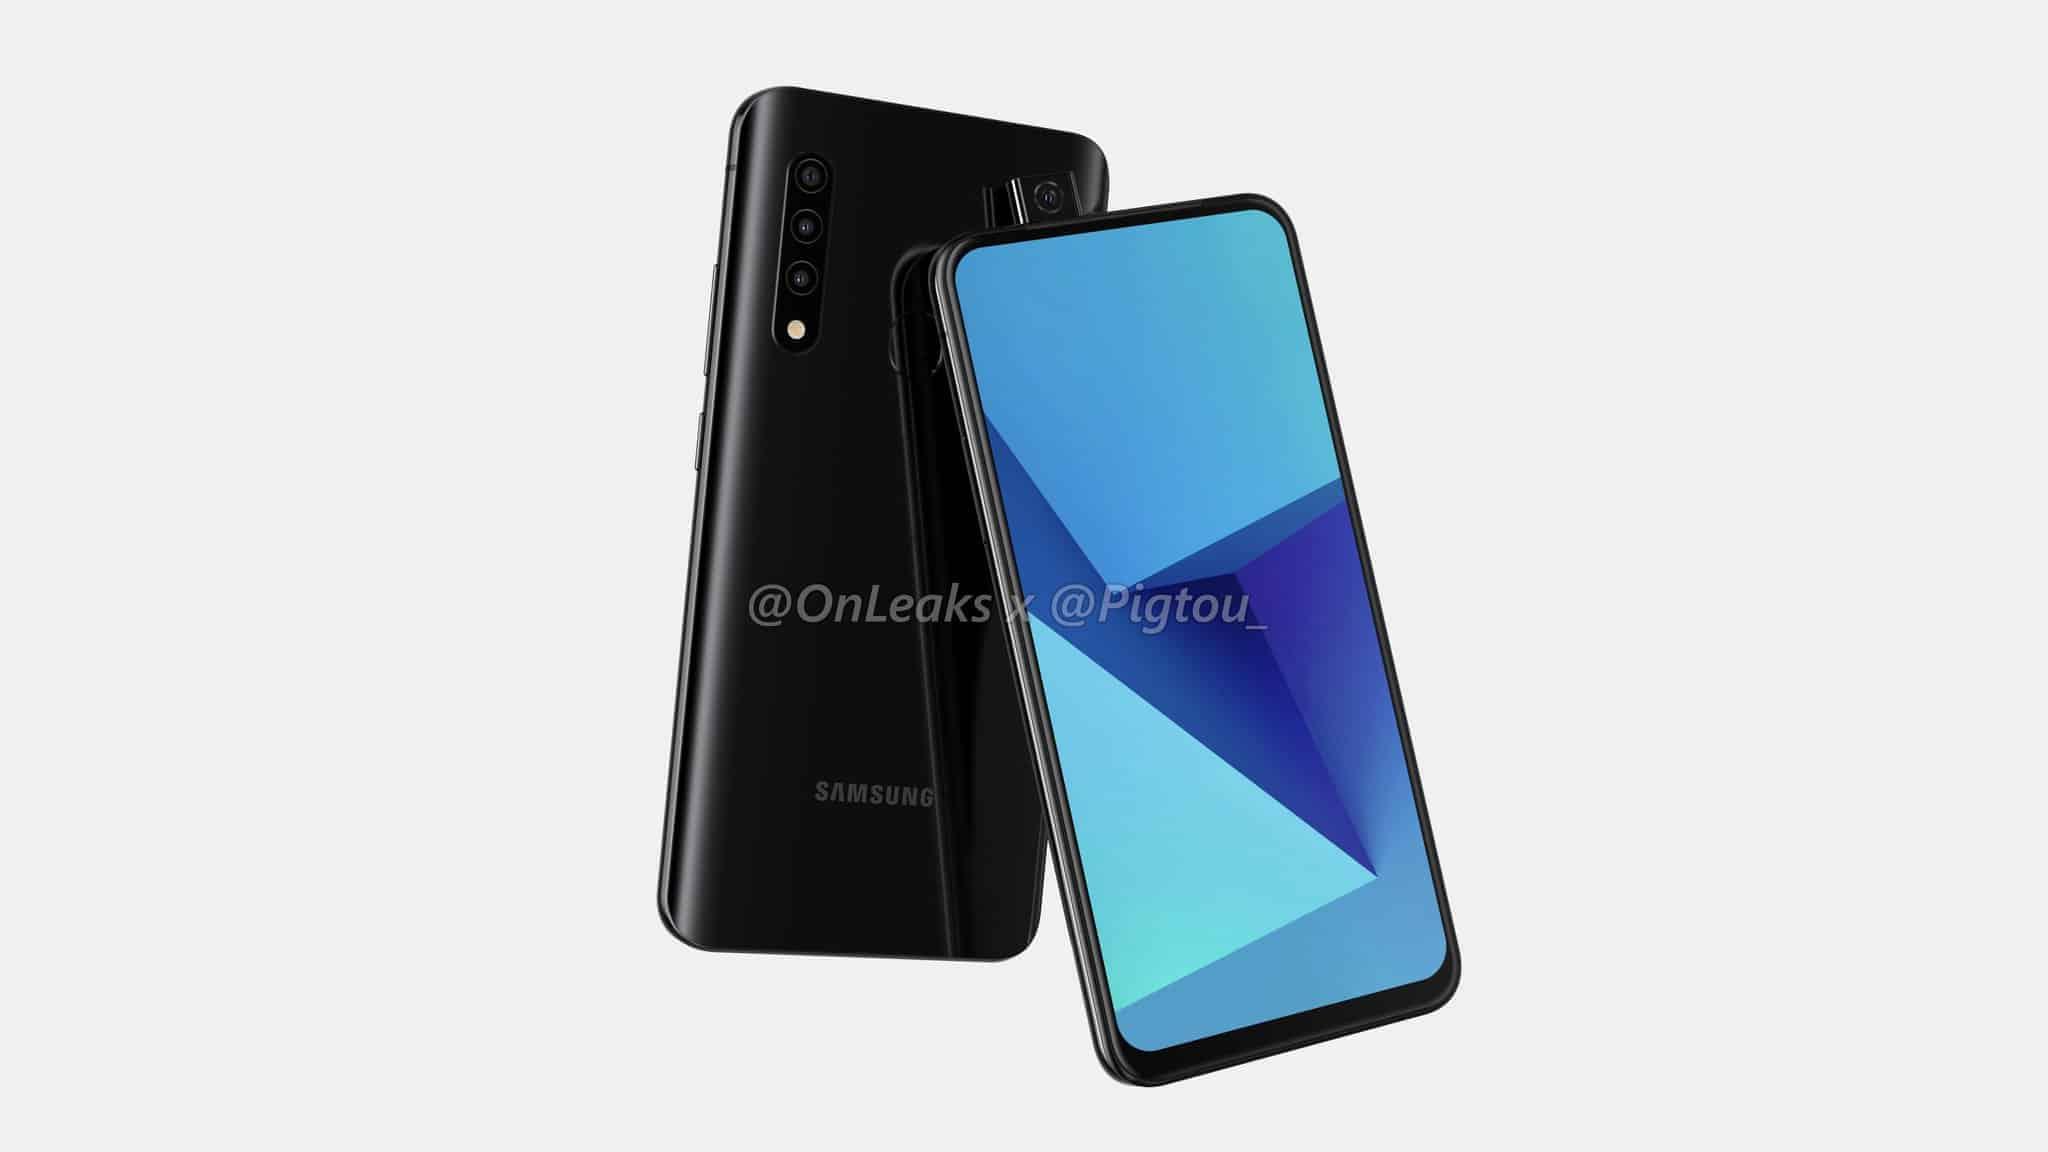 Samsung first smartphone pop up camera leak 2